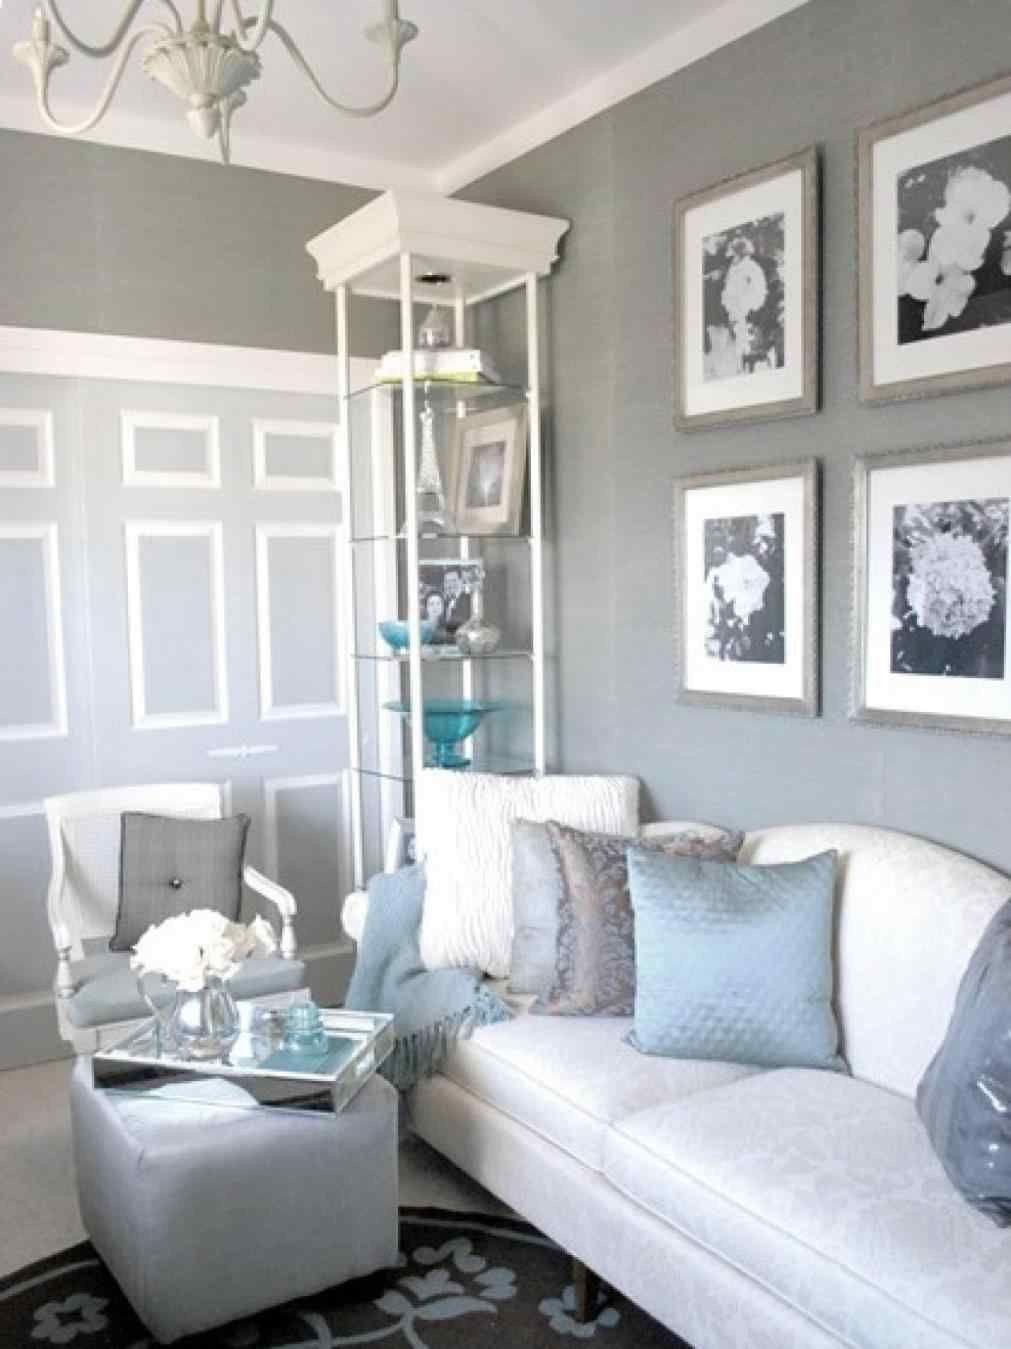 Pin On Living Room Blue Image Ideas